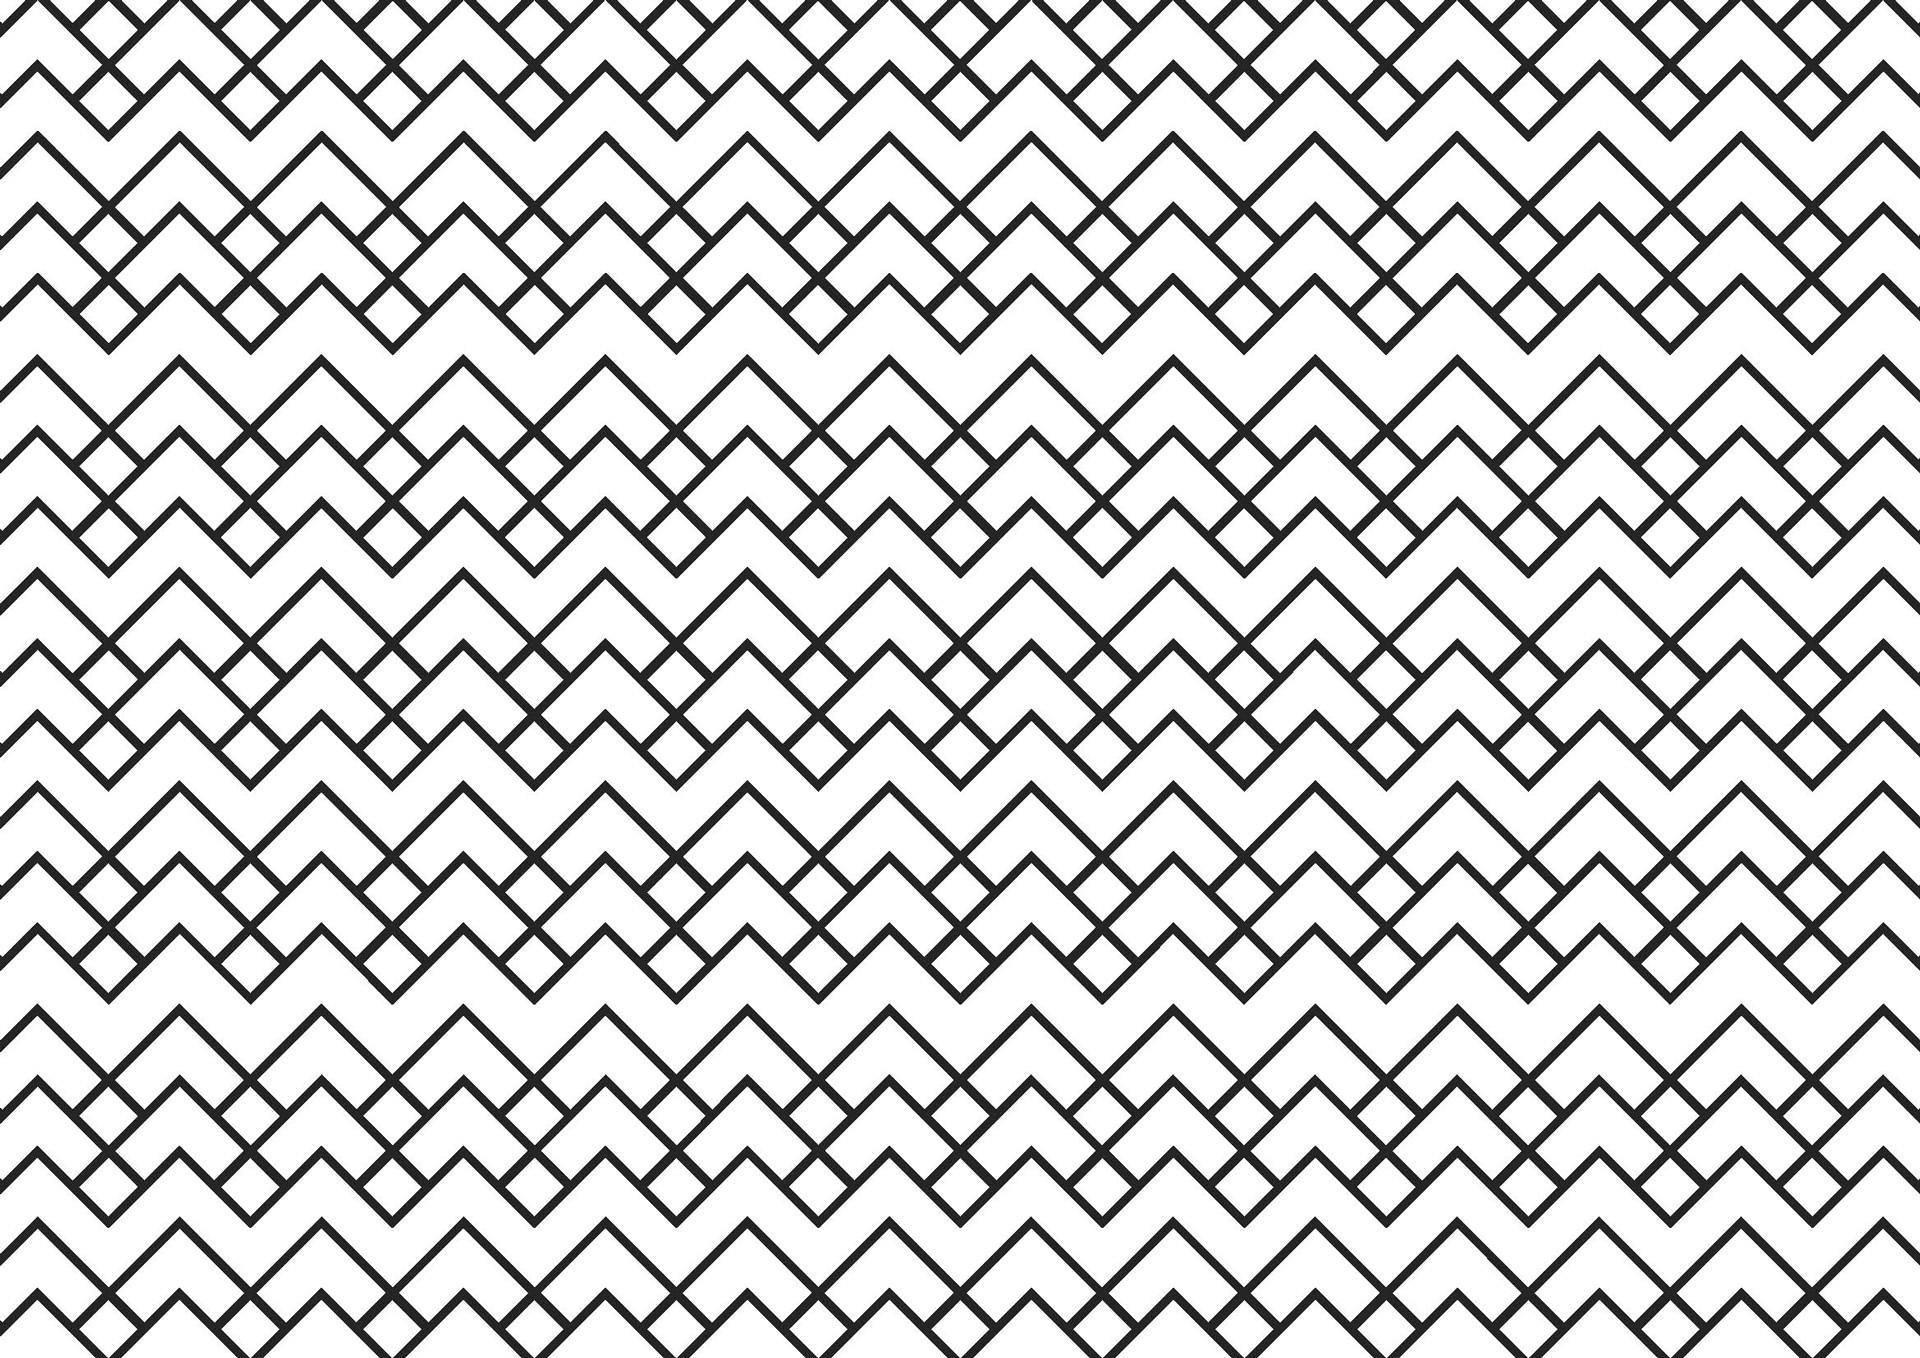 pattern_11